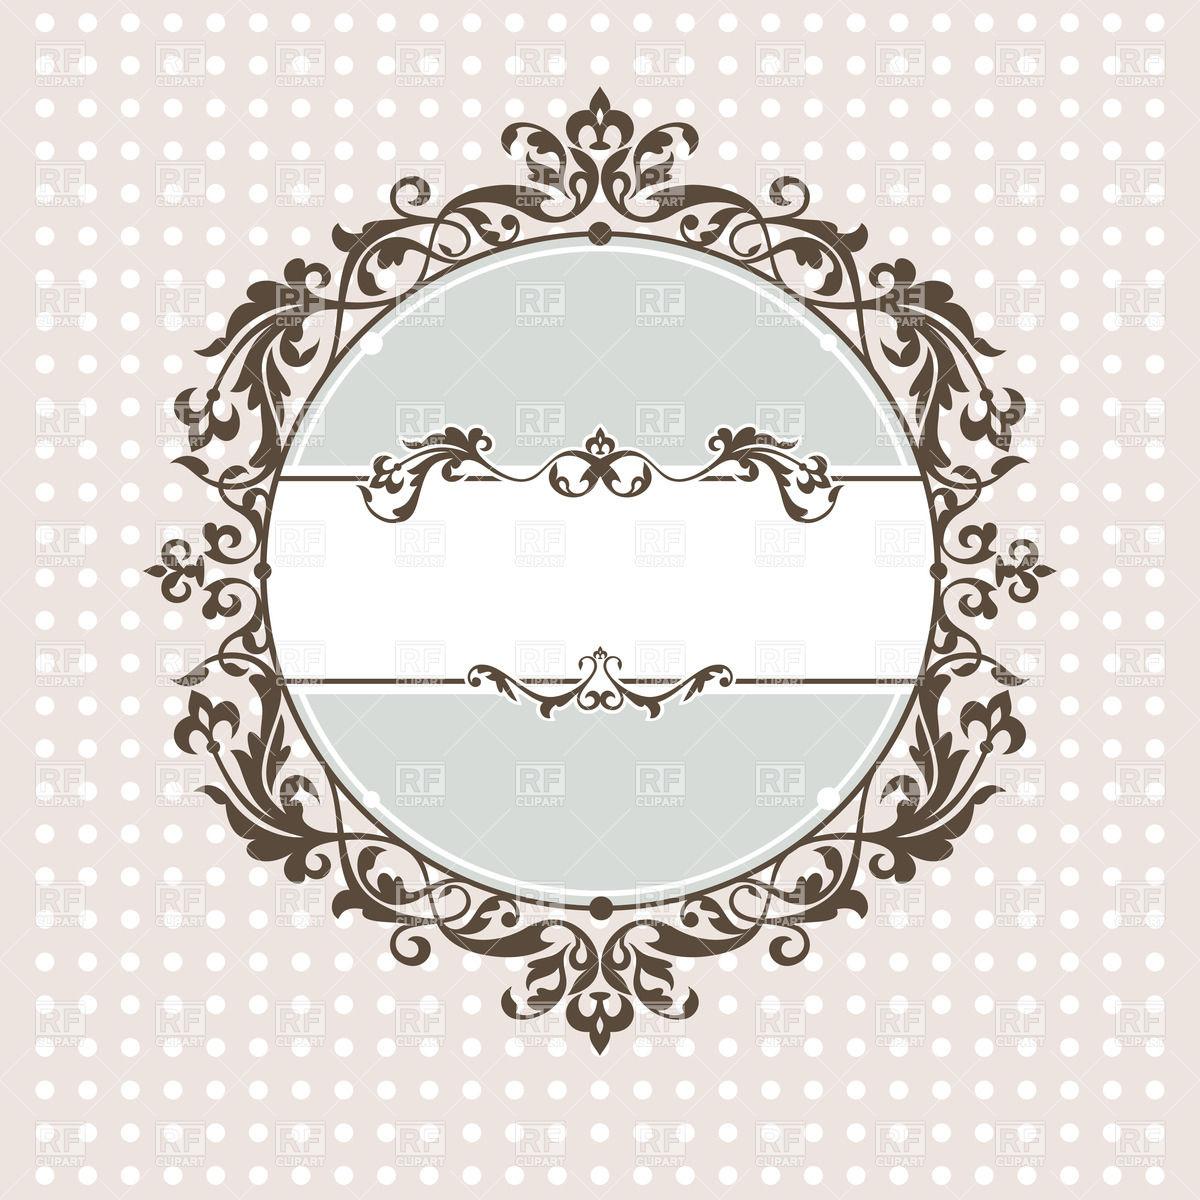 Vintage frame with lace edging onpolka dot background Vector Image.